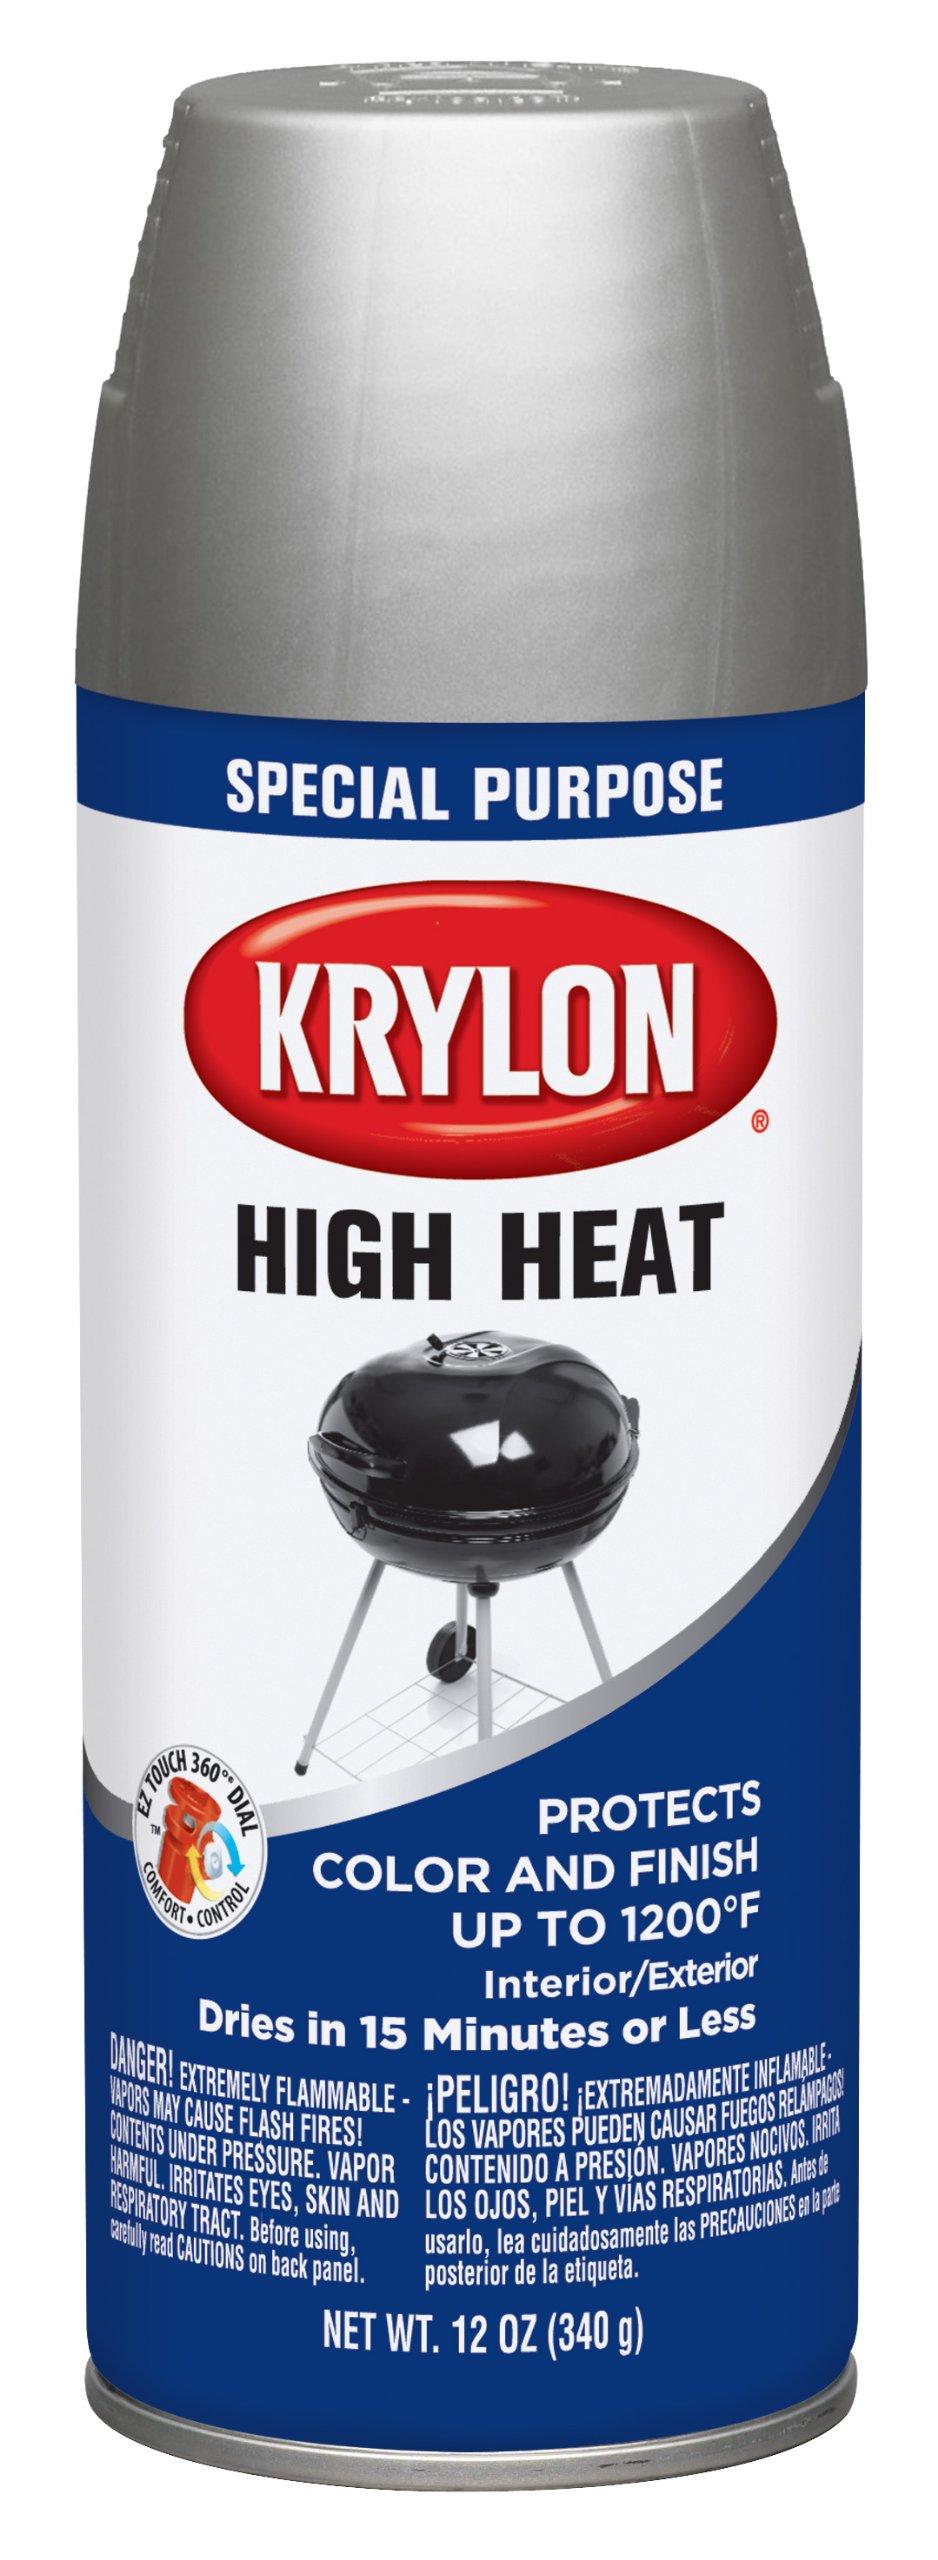 Krylon K01407000 Aluminum High Heat and Radiator Paint - 12 oz. Aerosol